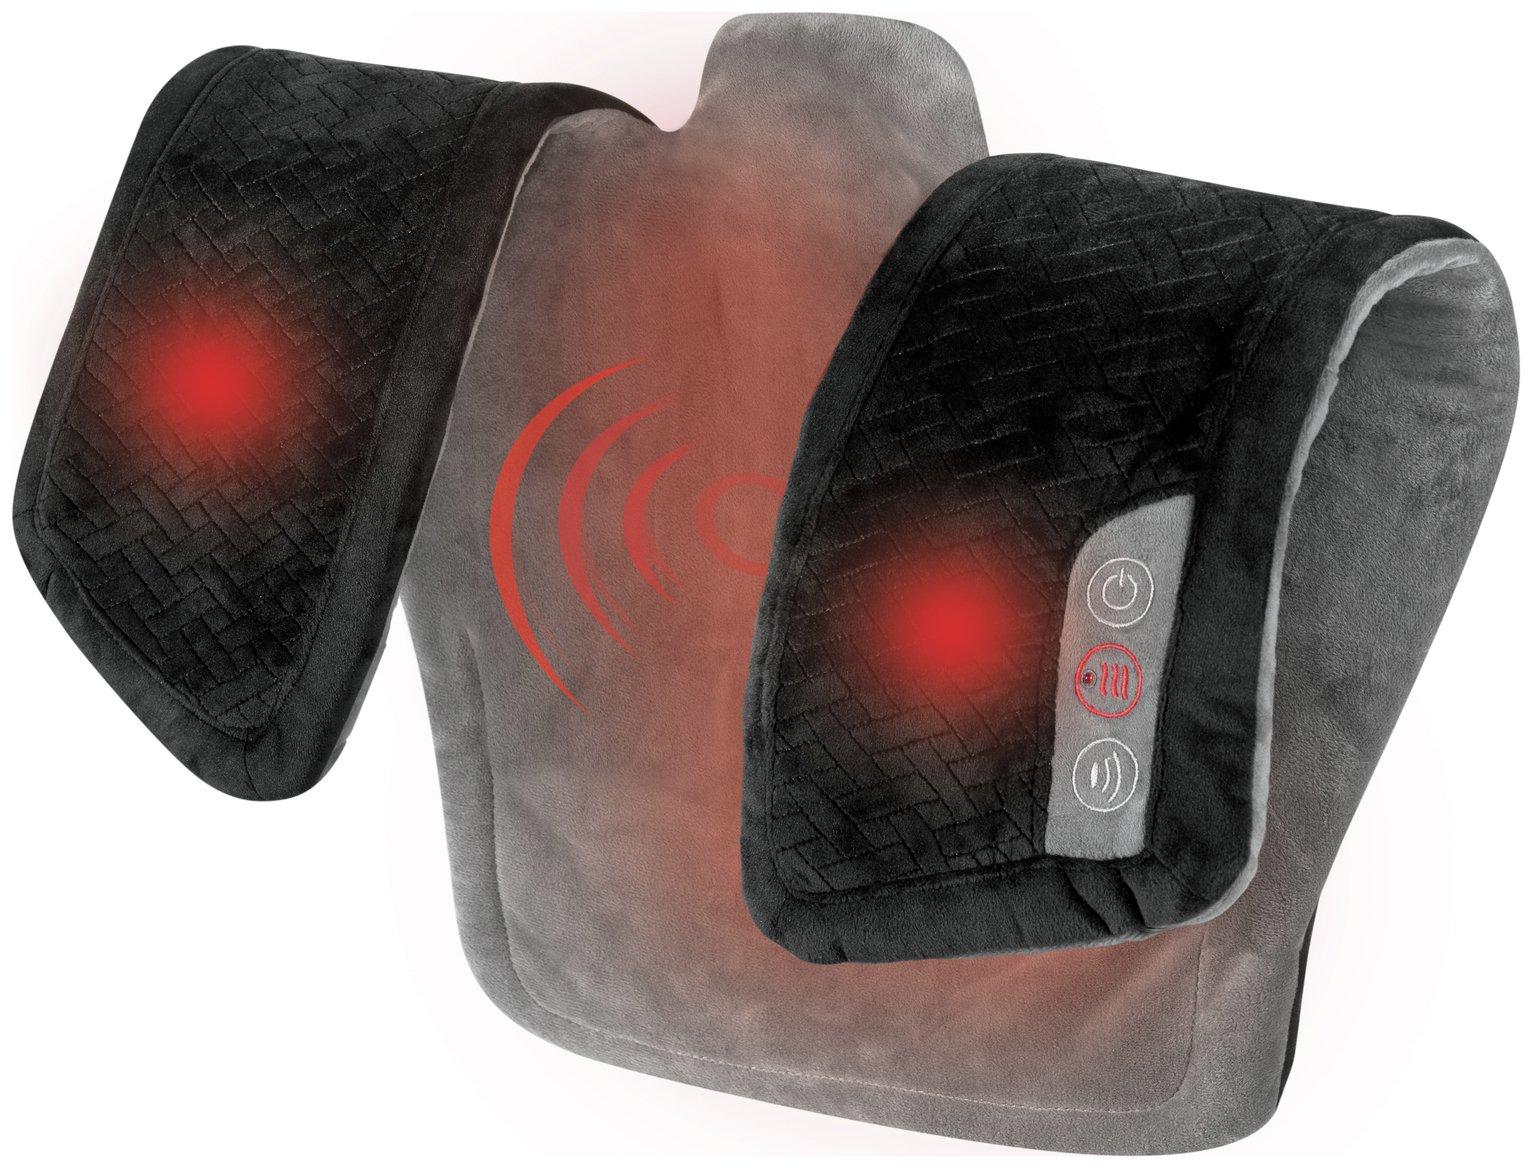 HoMedics Comfort Neck and Shoulder Massager